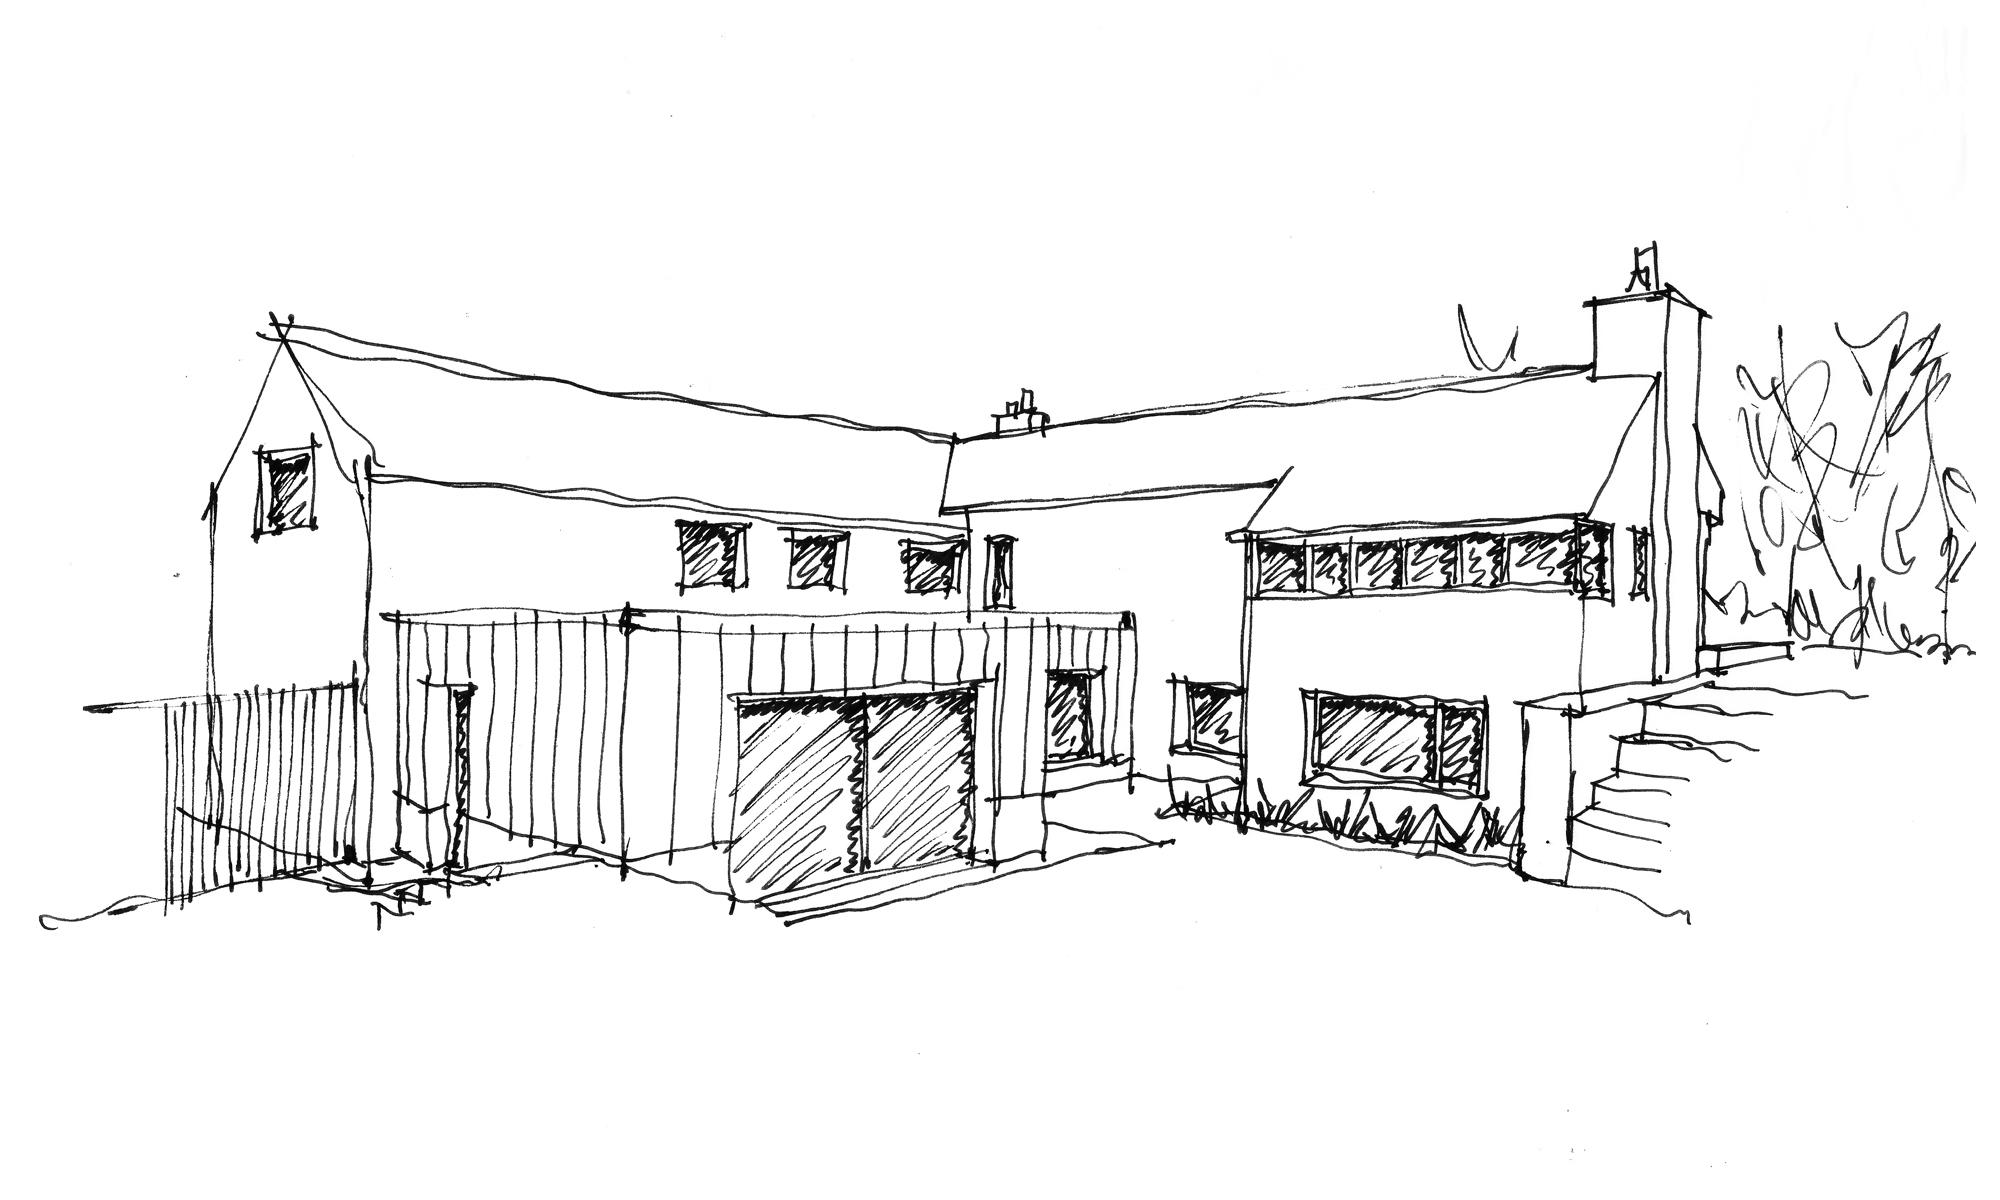 Extension Sketch